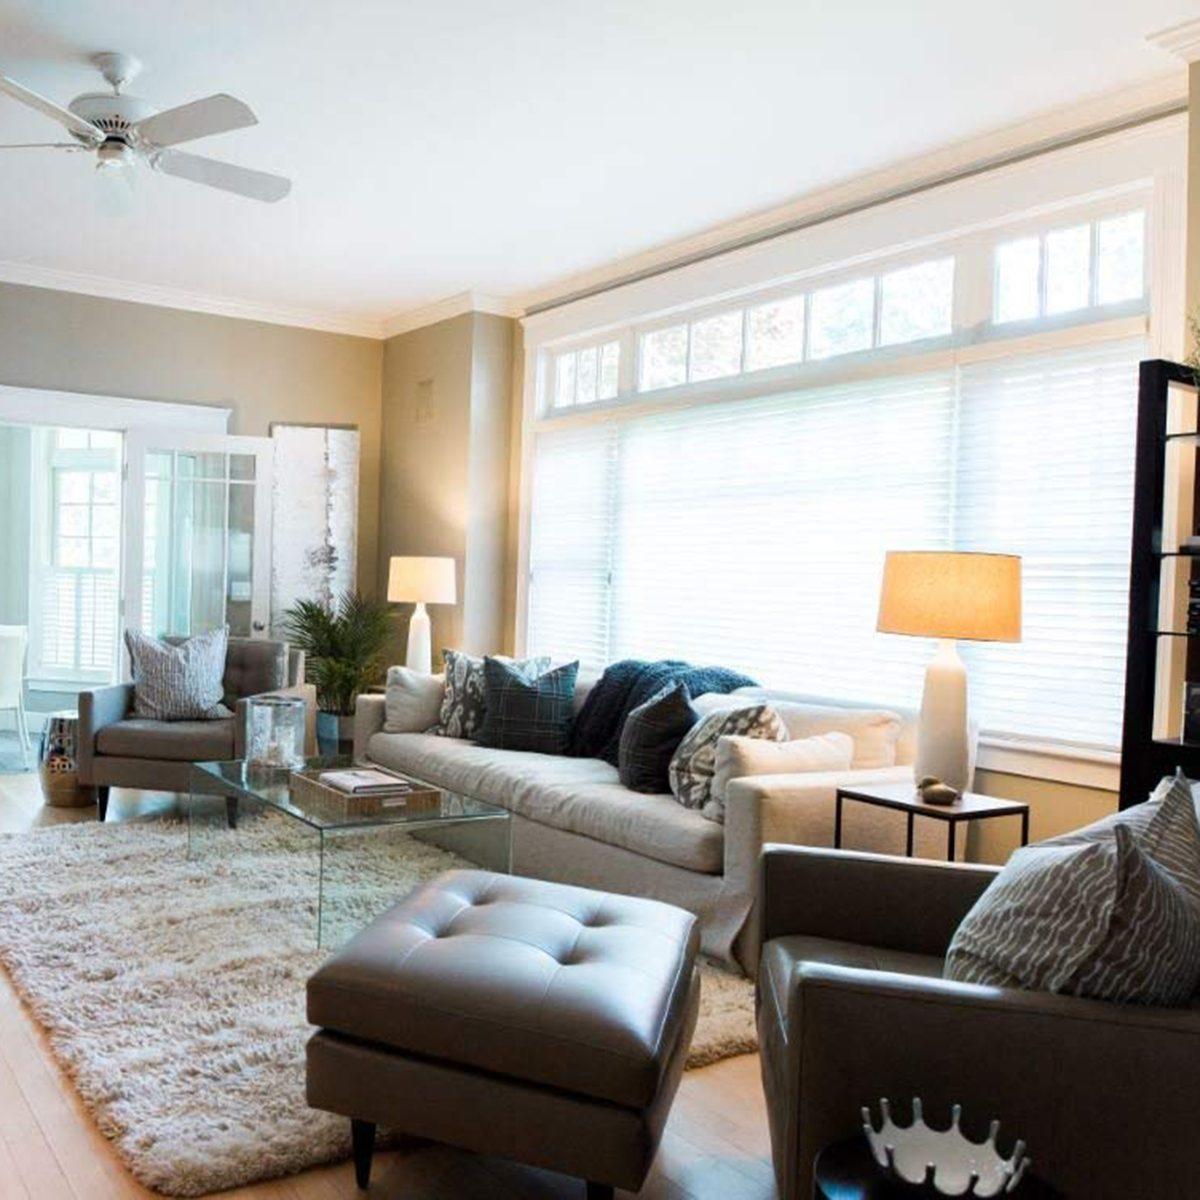 Lit living room